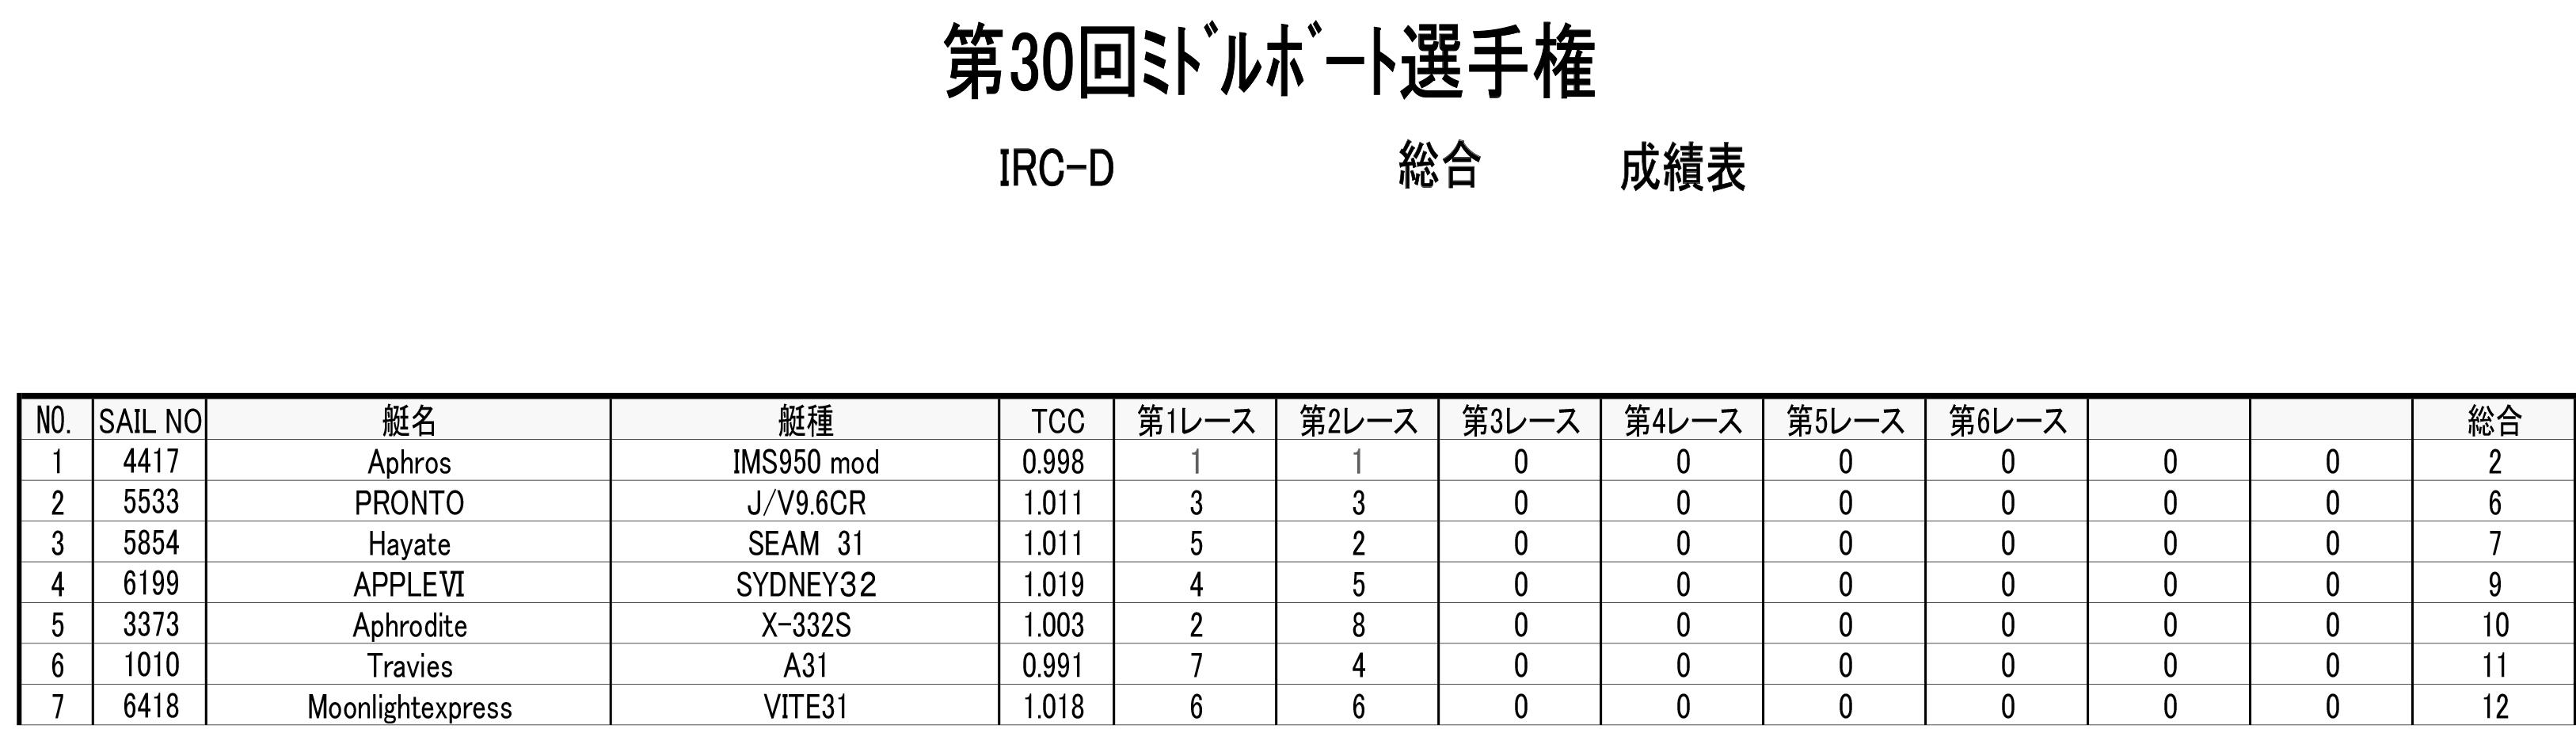 2018-05-06_ircd